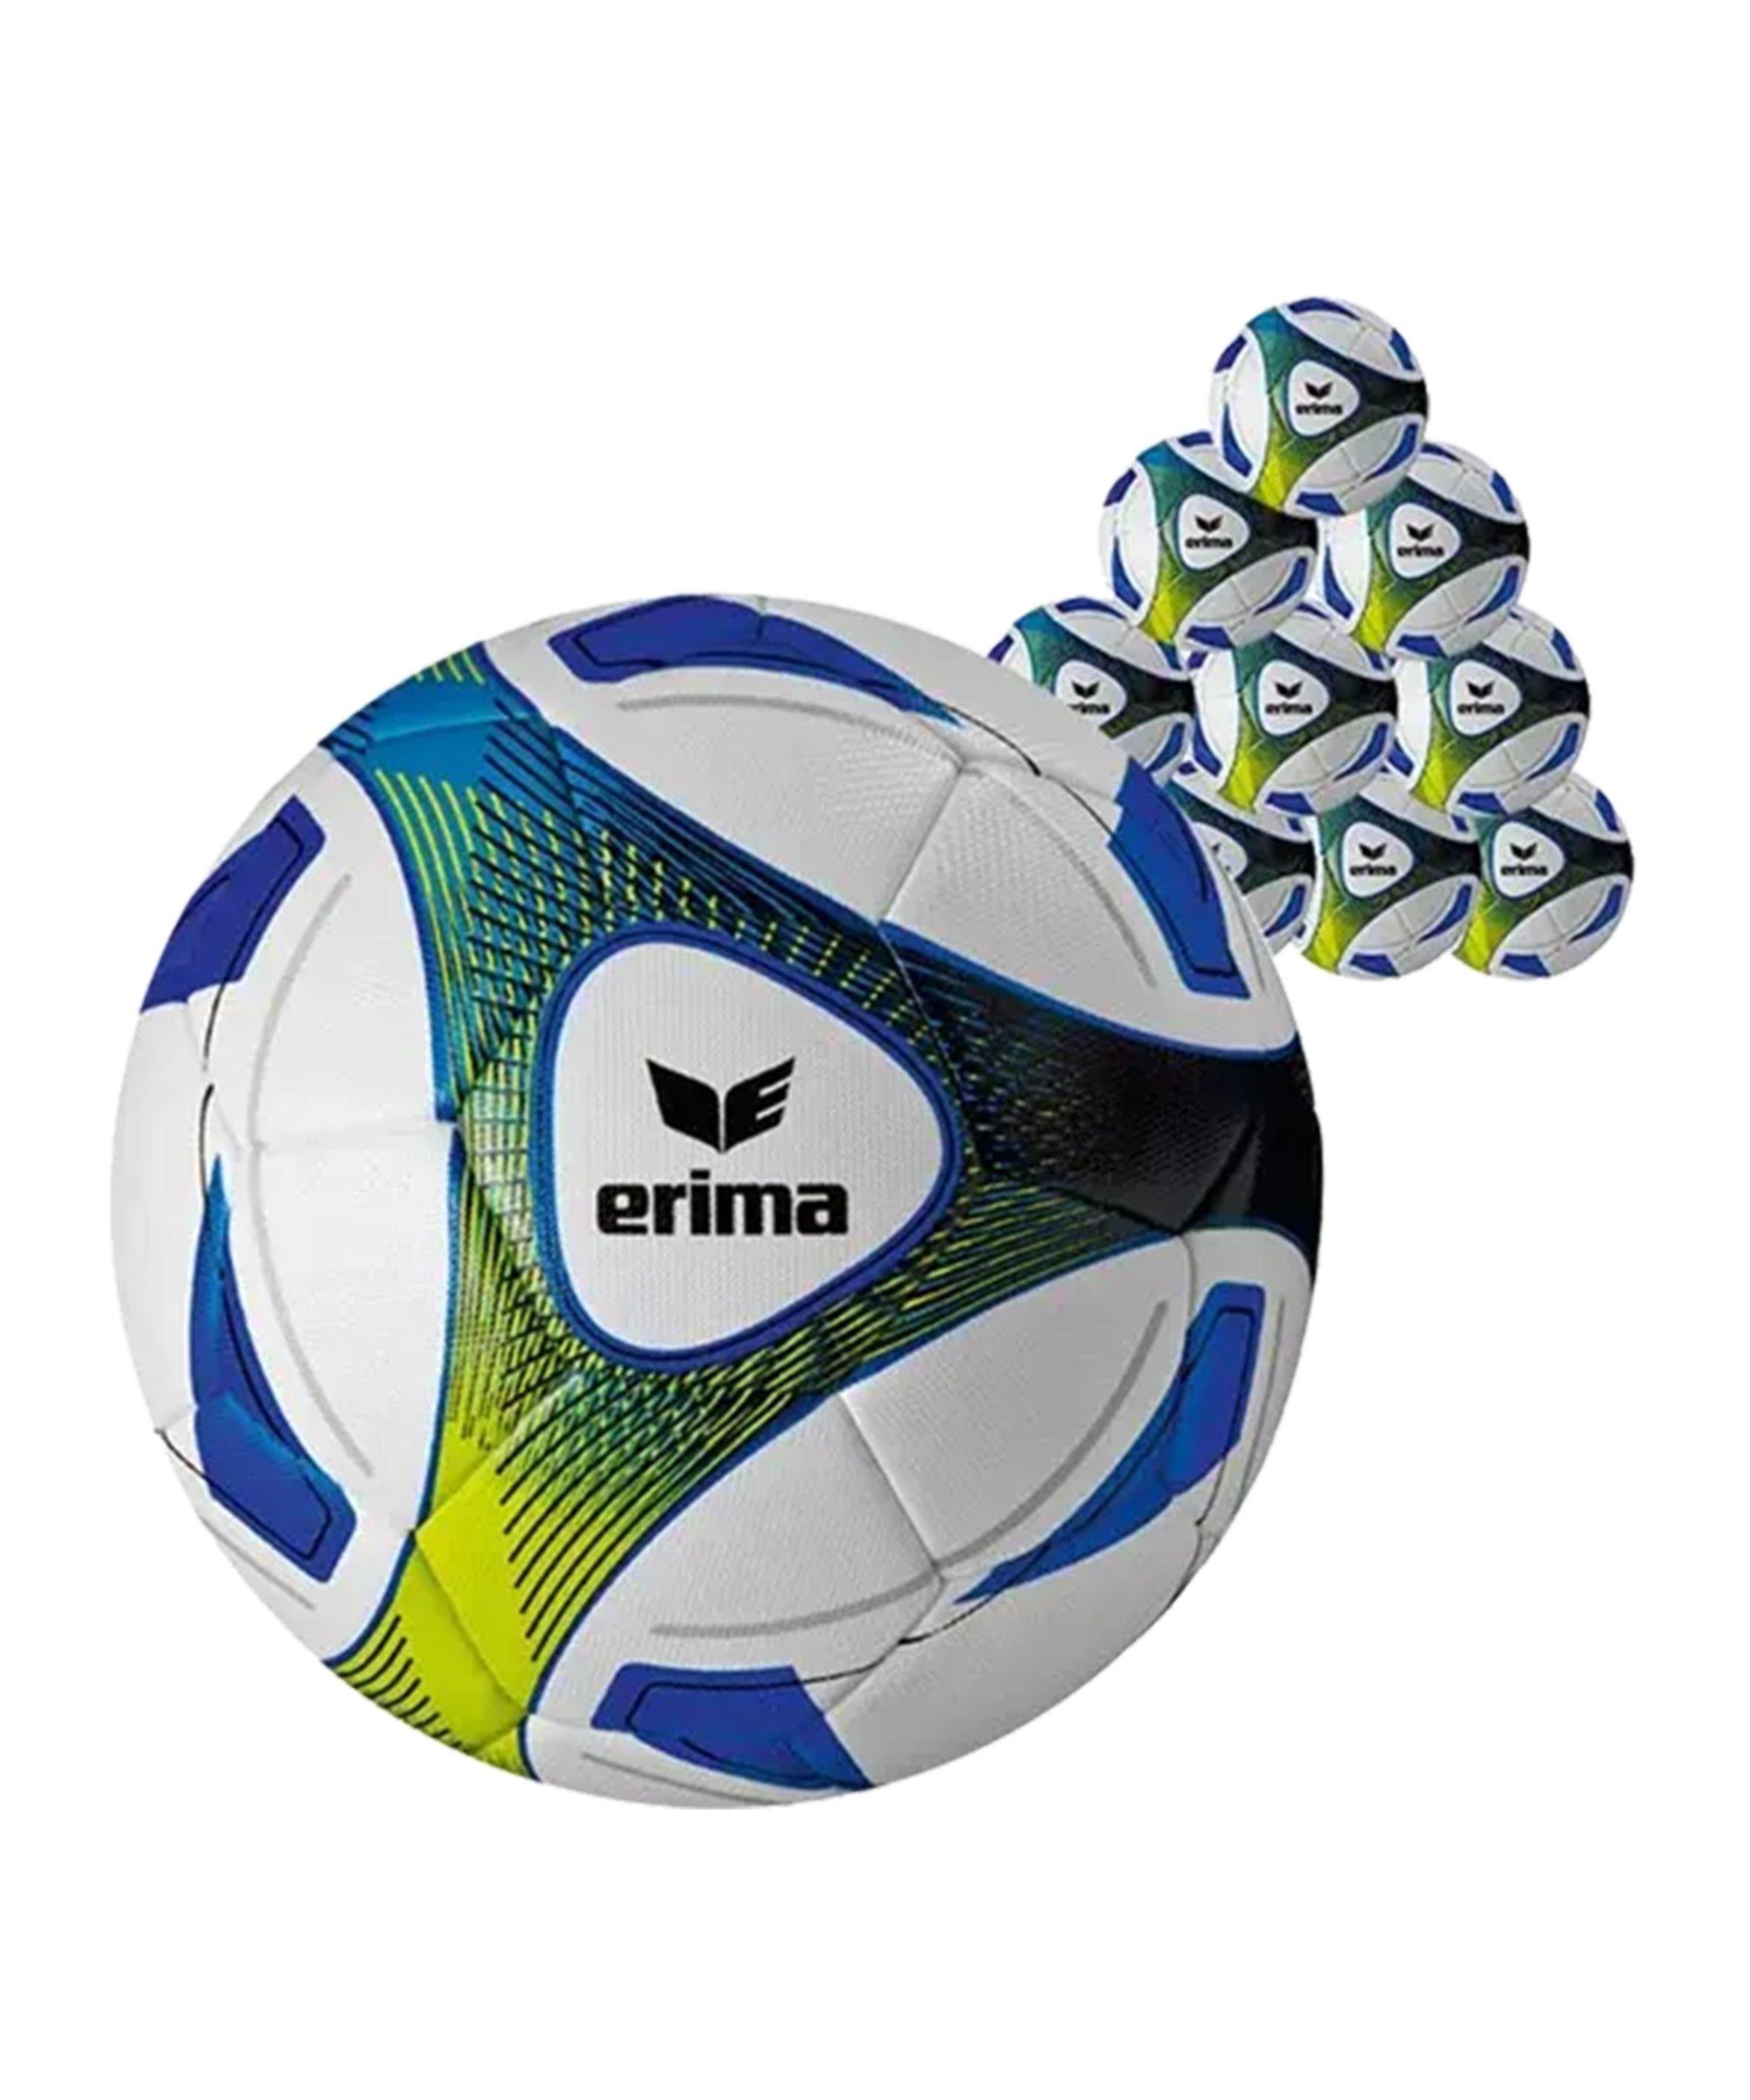 Erima 20xTrainingsball Hybrid Blau Gelb - blau